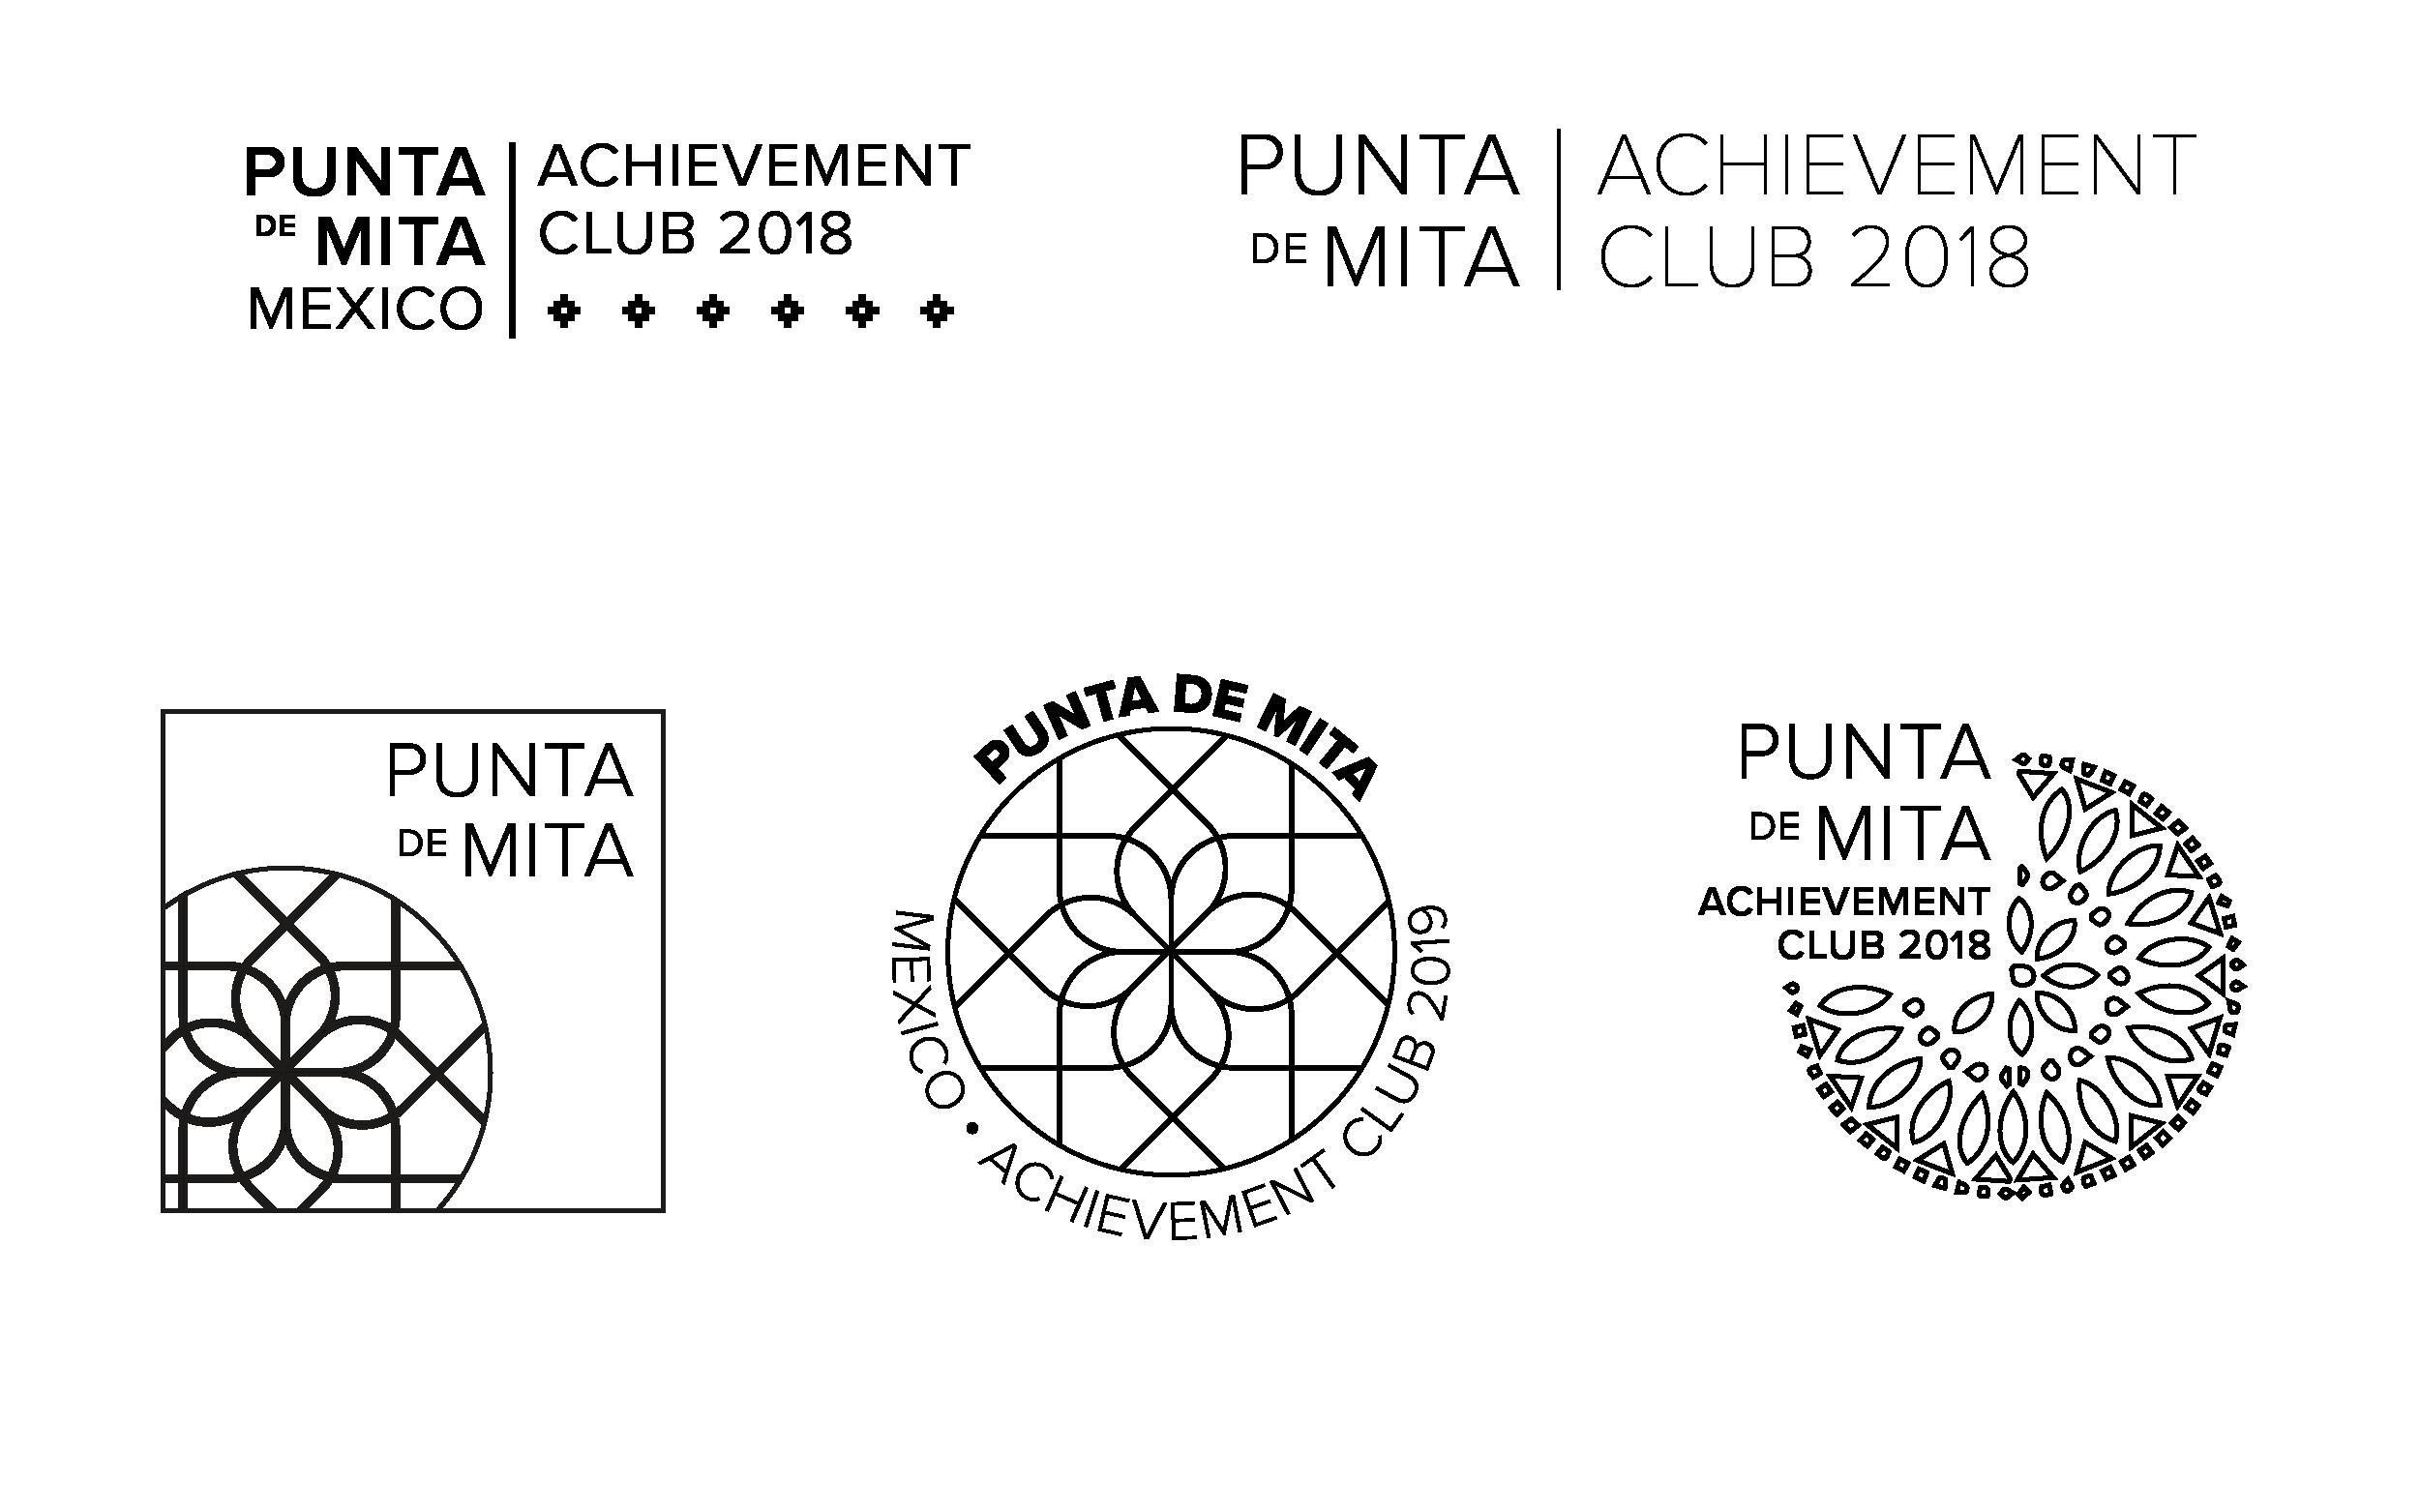 Punta de mita logo process_round 1